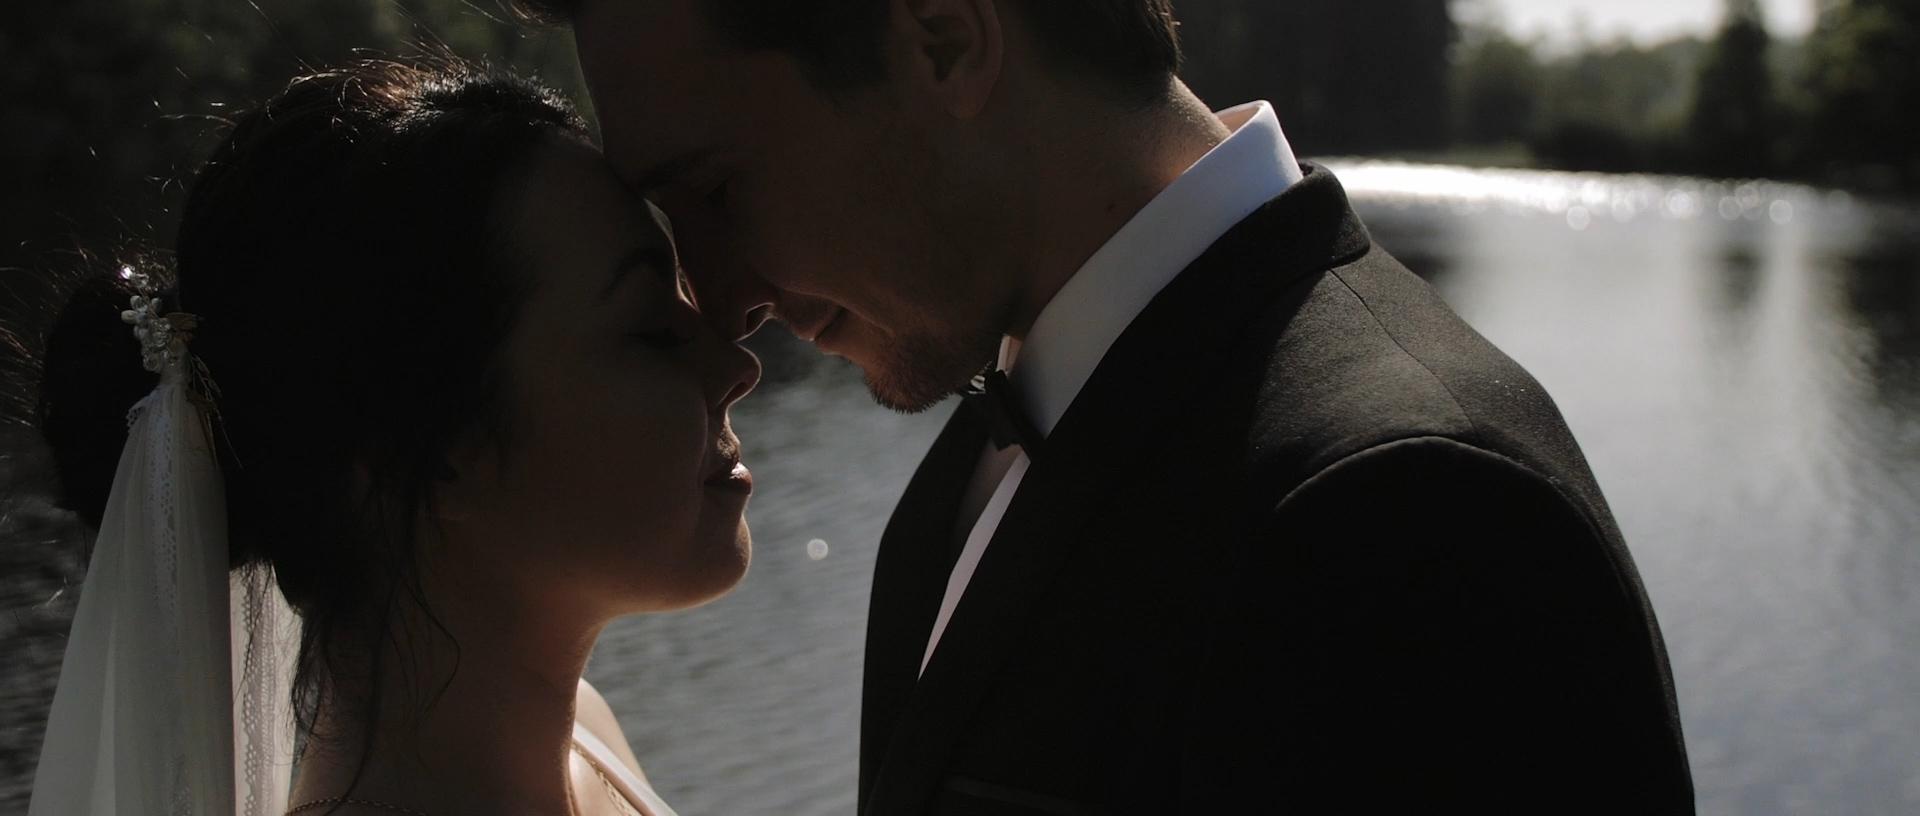 banchory-wedding-videographer_LL_07.jpg